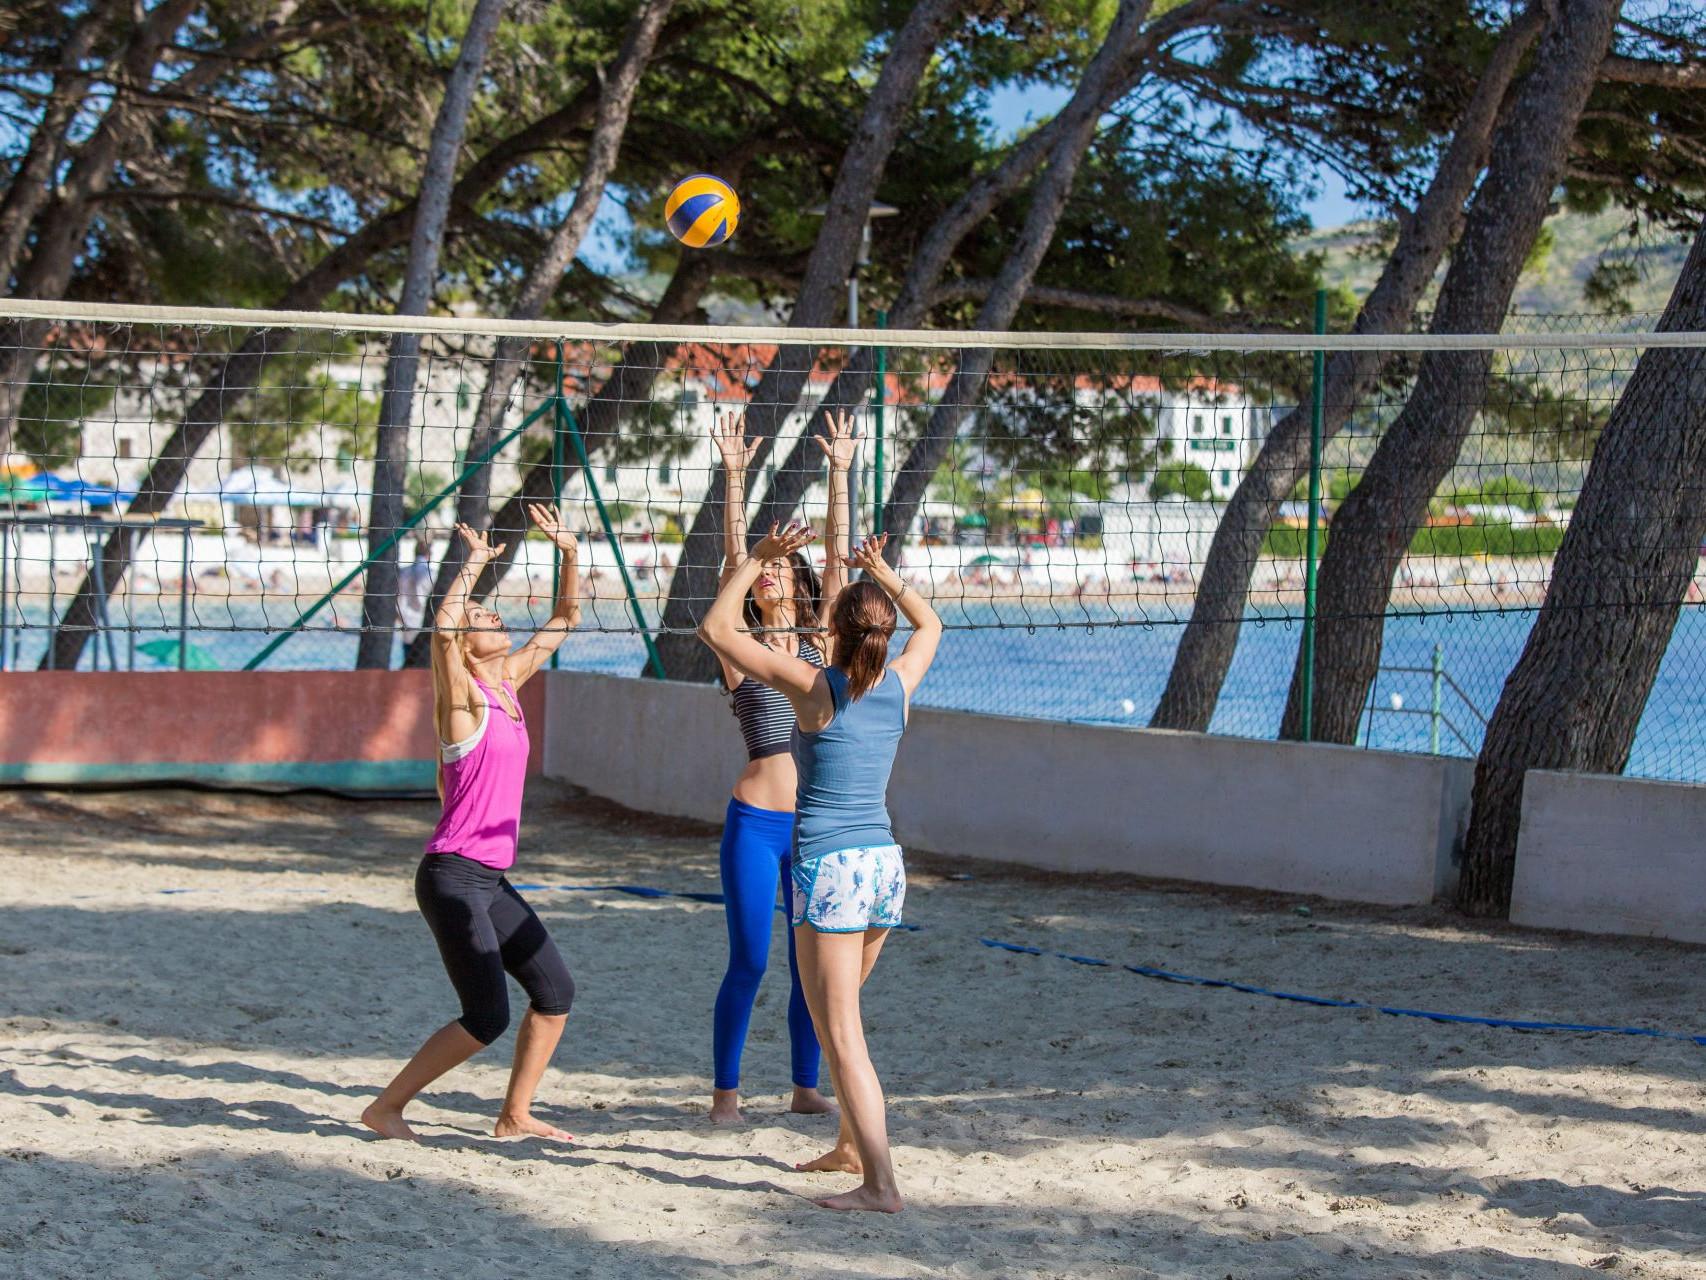 volleyball 02 14825478682 o 1 uai - Zora Hotel